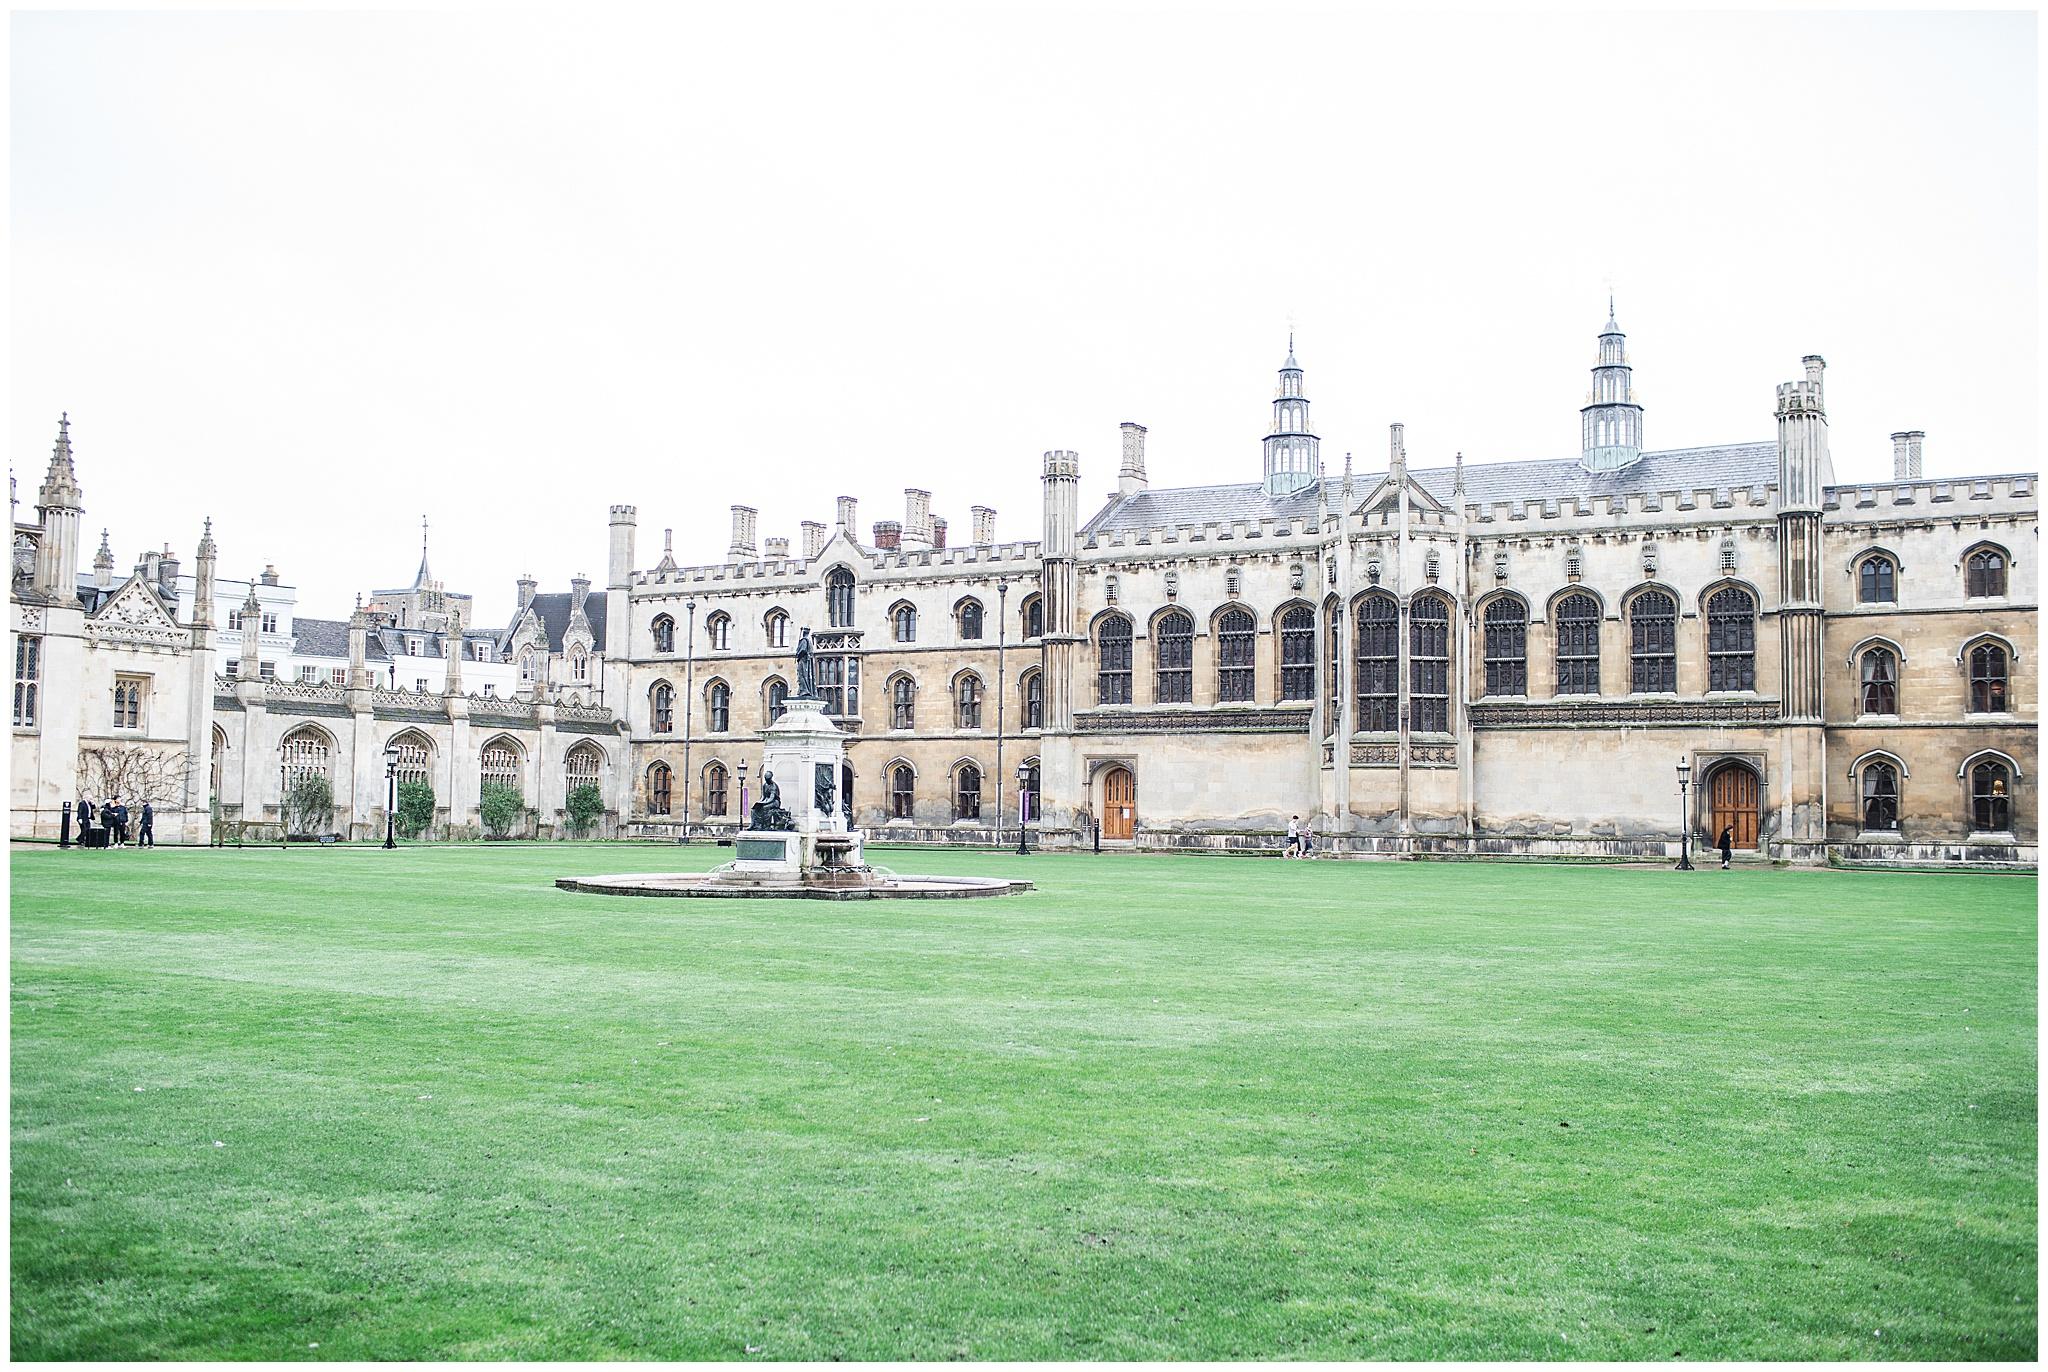 Cambridge_day2_0184.jpg